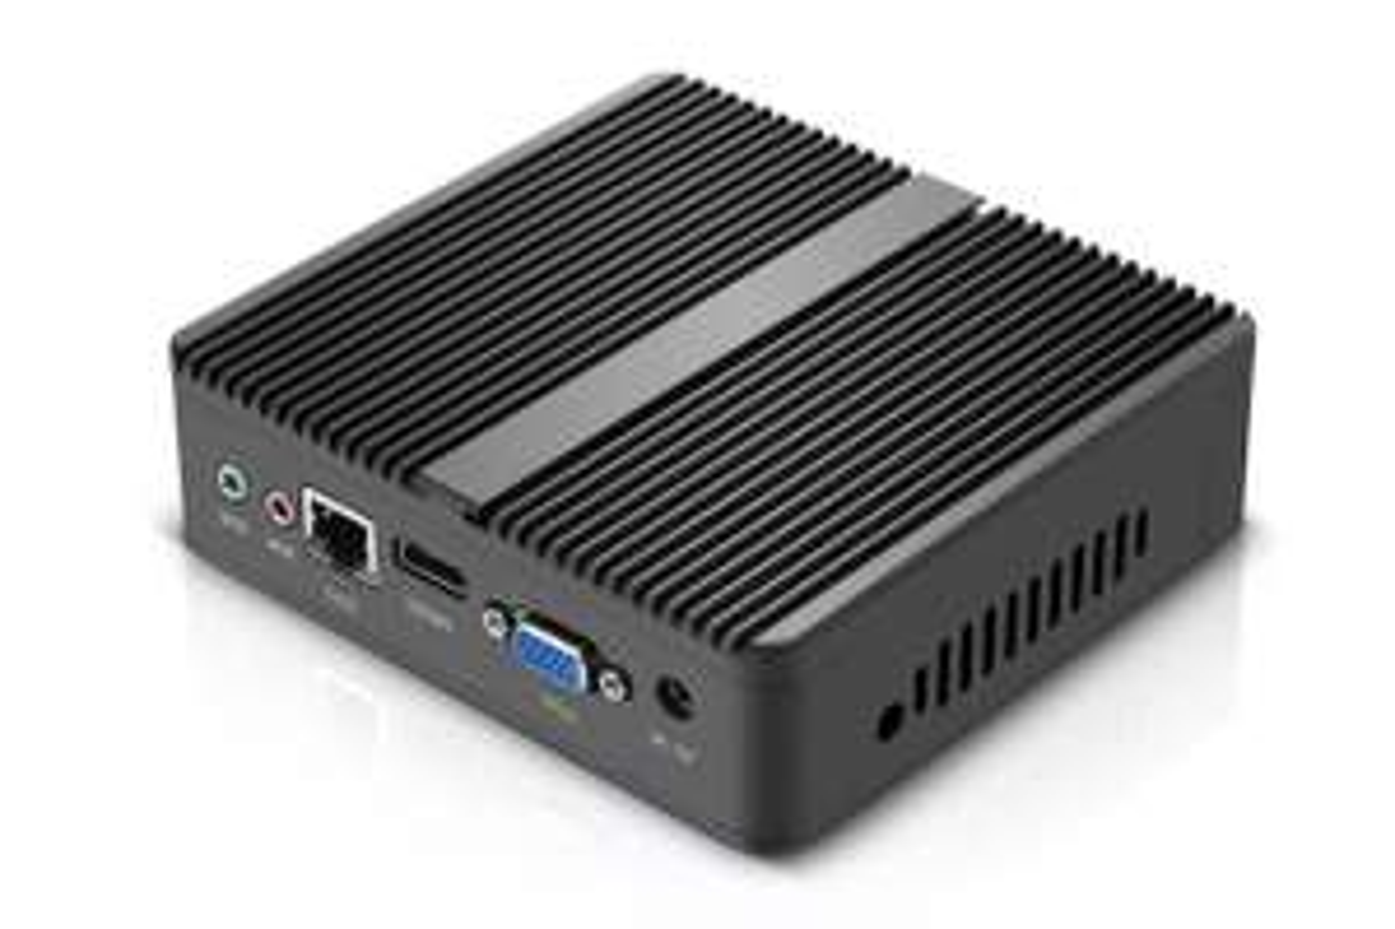 Mini PC XCY X30 Intel Core I7-4500U Barebone 1.8GHz Intel HD Graphics 4200 Windows 10